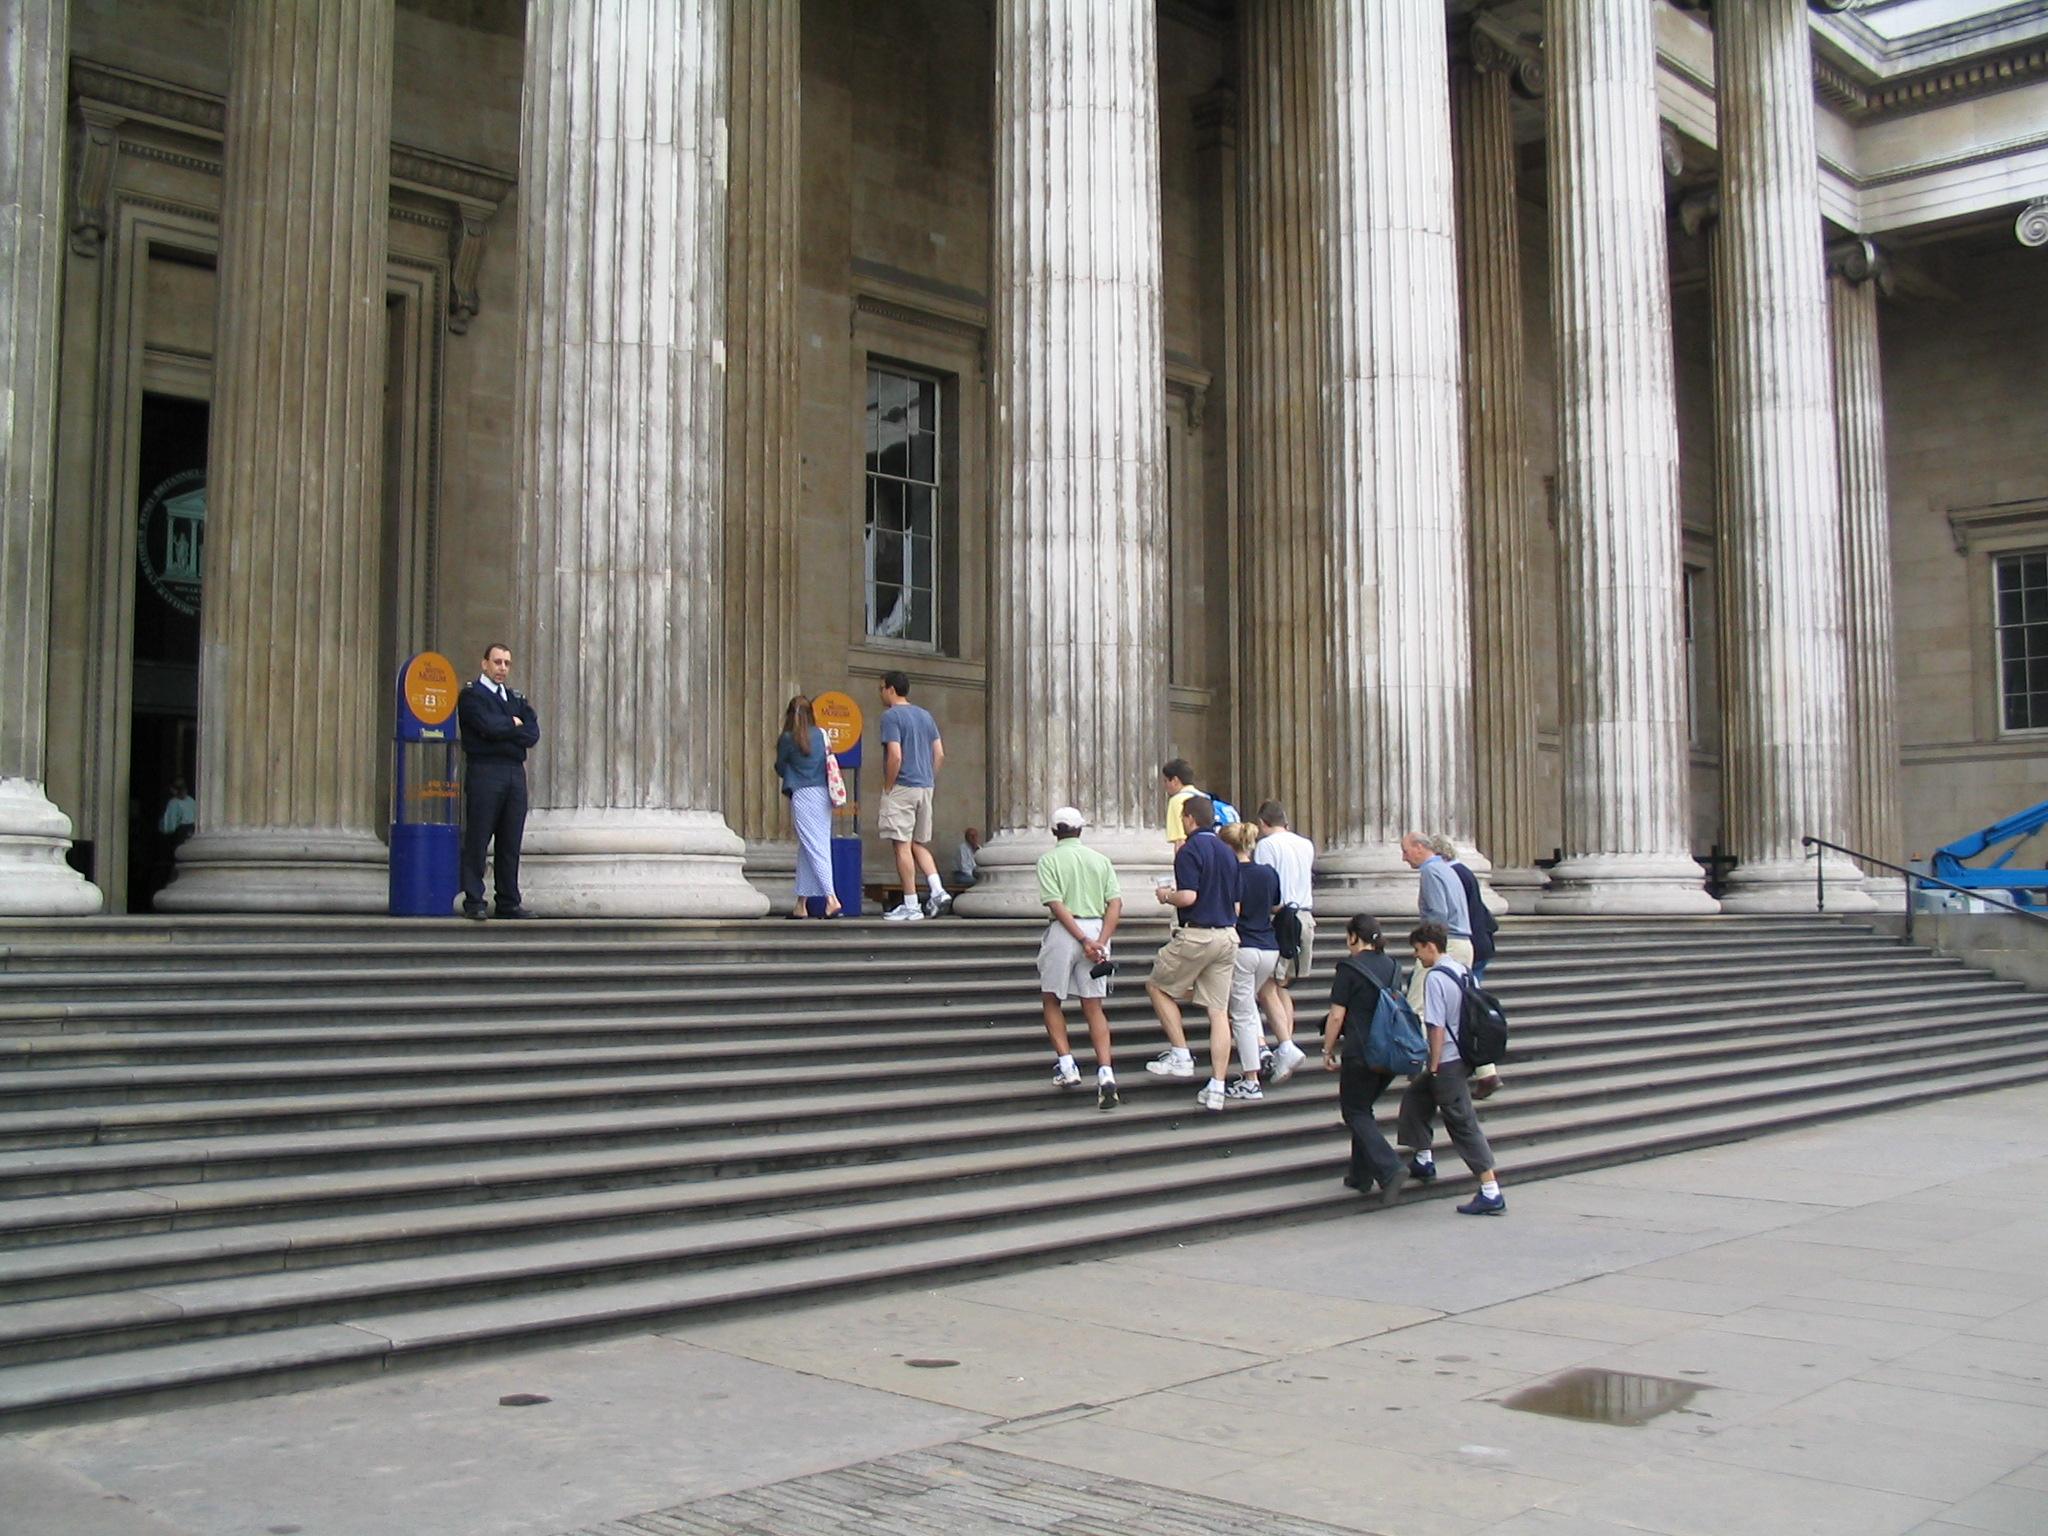 British Museum Entranceway